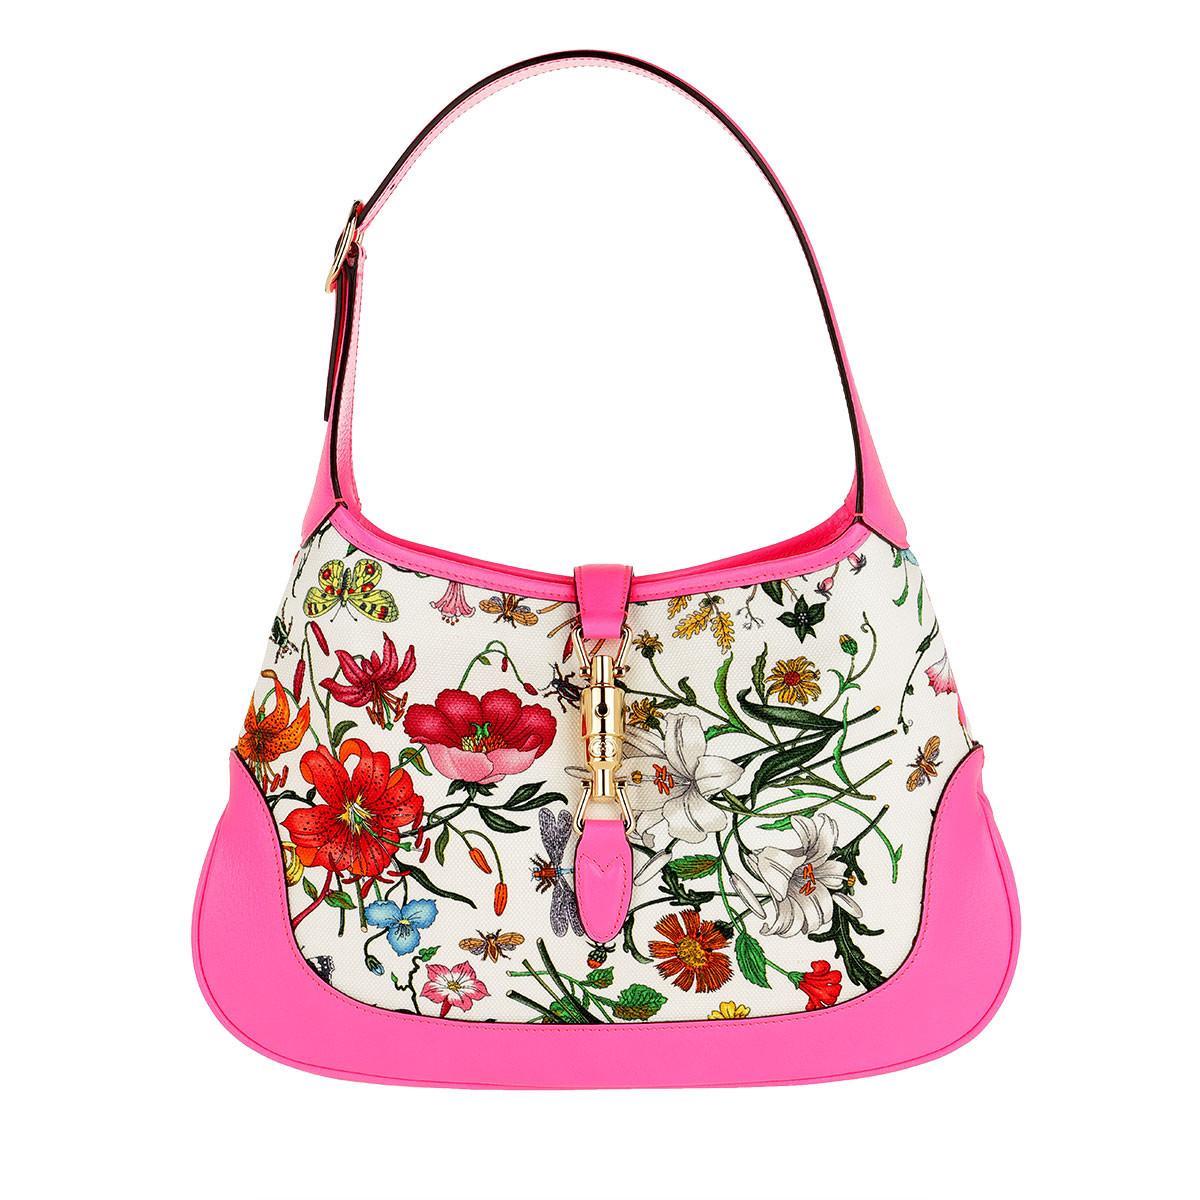 Gucci Hobo Bag - Jackie Medium Flora Hobo Bag Fuchsia - in bunt - für Damen